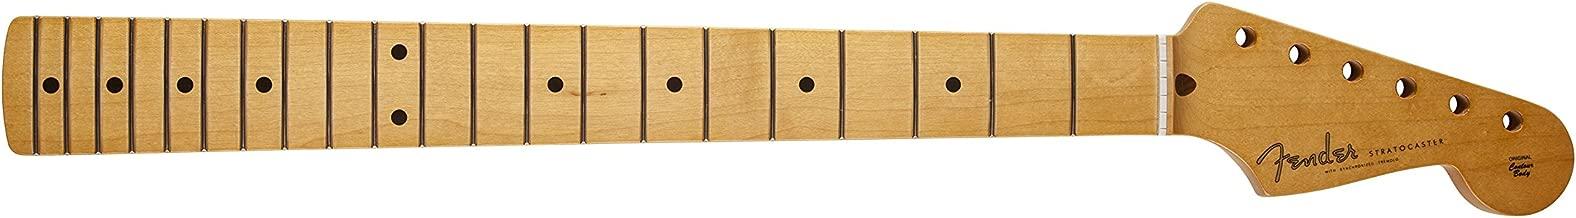 Best fender stratocaster fretboard Reviews